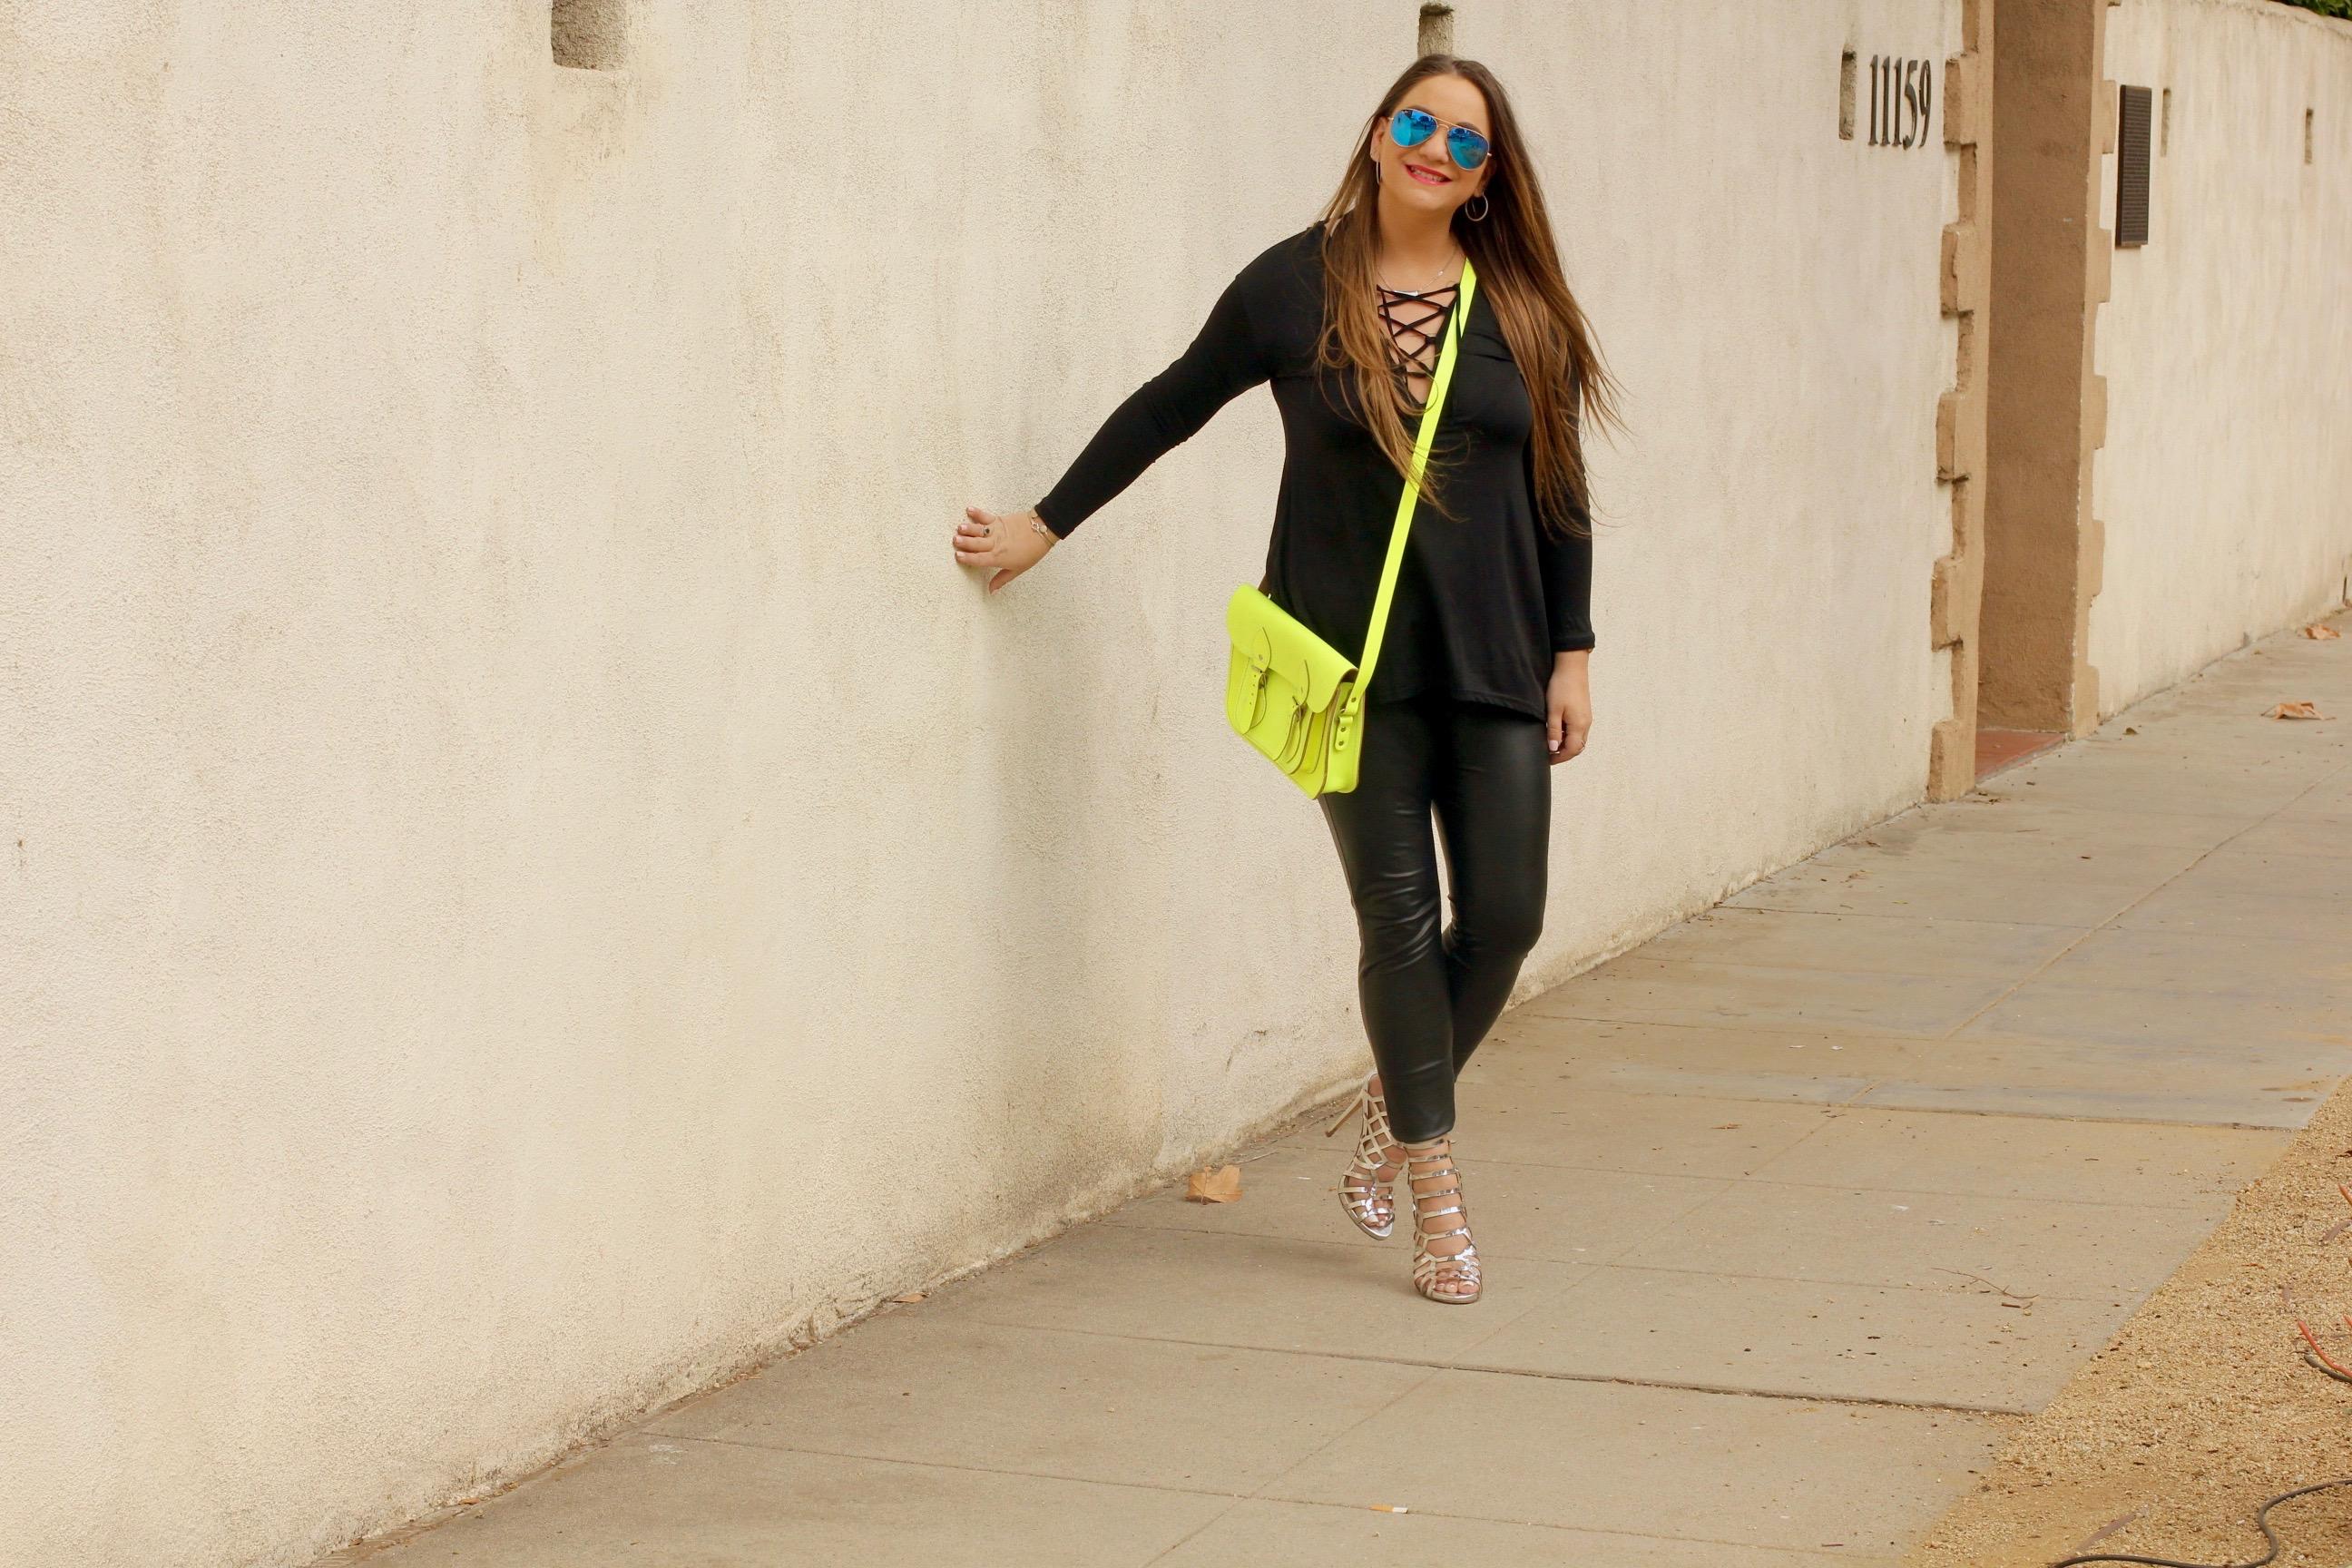 missyonmadison, melissa tierney, hue leggings, heatherette leggings, vegan leather leggings, black leather leggings, silver gladiator sandals, silver caged heels, silver gladiator heels, black long sleeve going out top, black long sleeve caged top, ray bans, mirrored ray bans, red lipstick, brunette hairstyle, leather leggings, la style, fashion blogger, fashion blog, style blogger, black long sleeve criss cross top, neon cambridge satchel, neon satchel, yellow cambridge satchel, date night outfit,